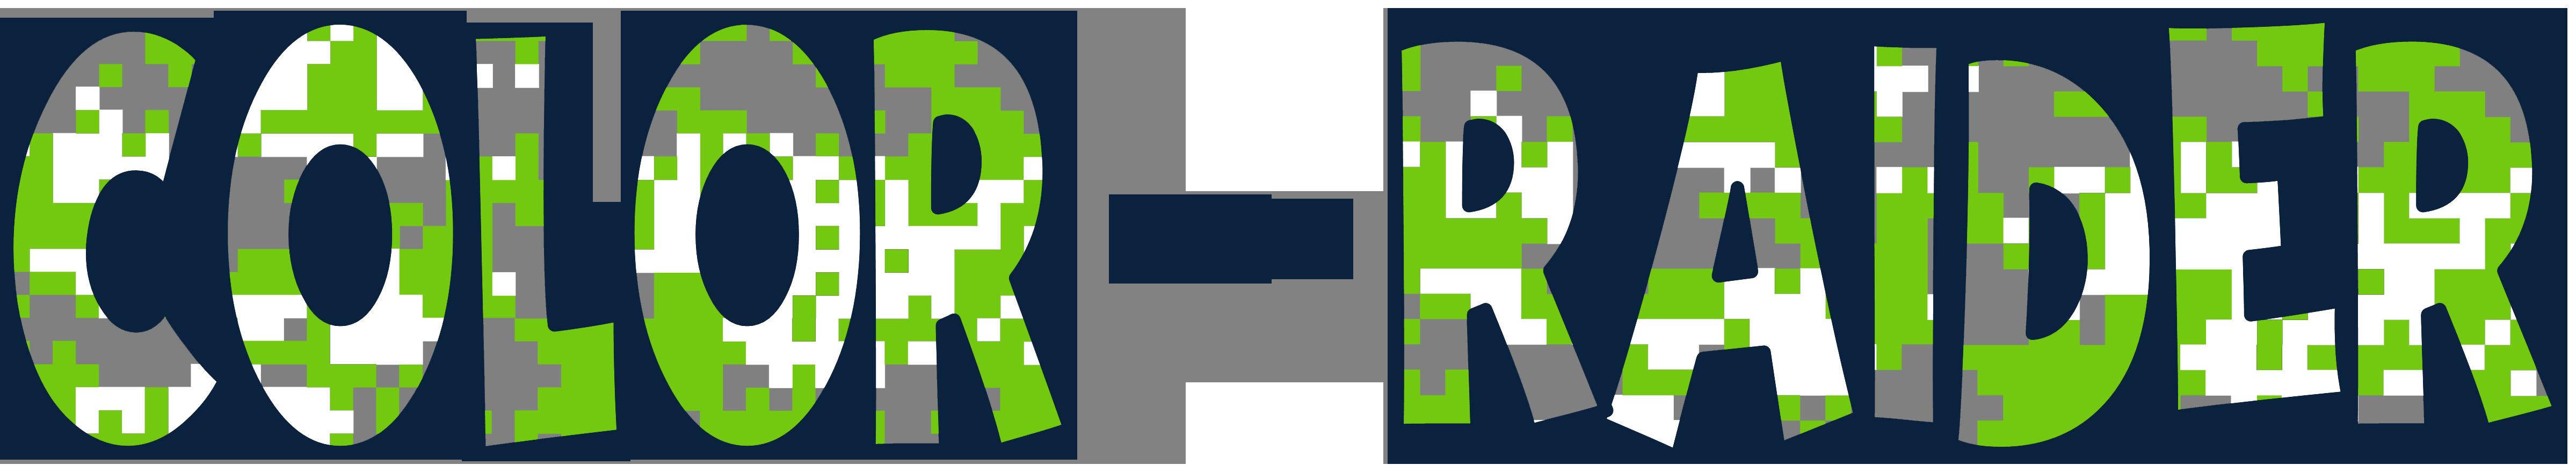 cmr-logo-navy-outline_2017